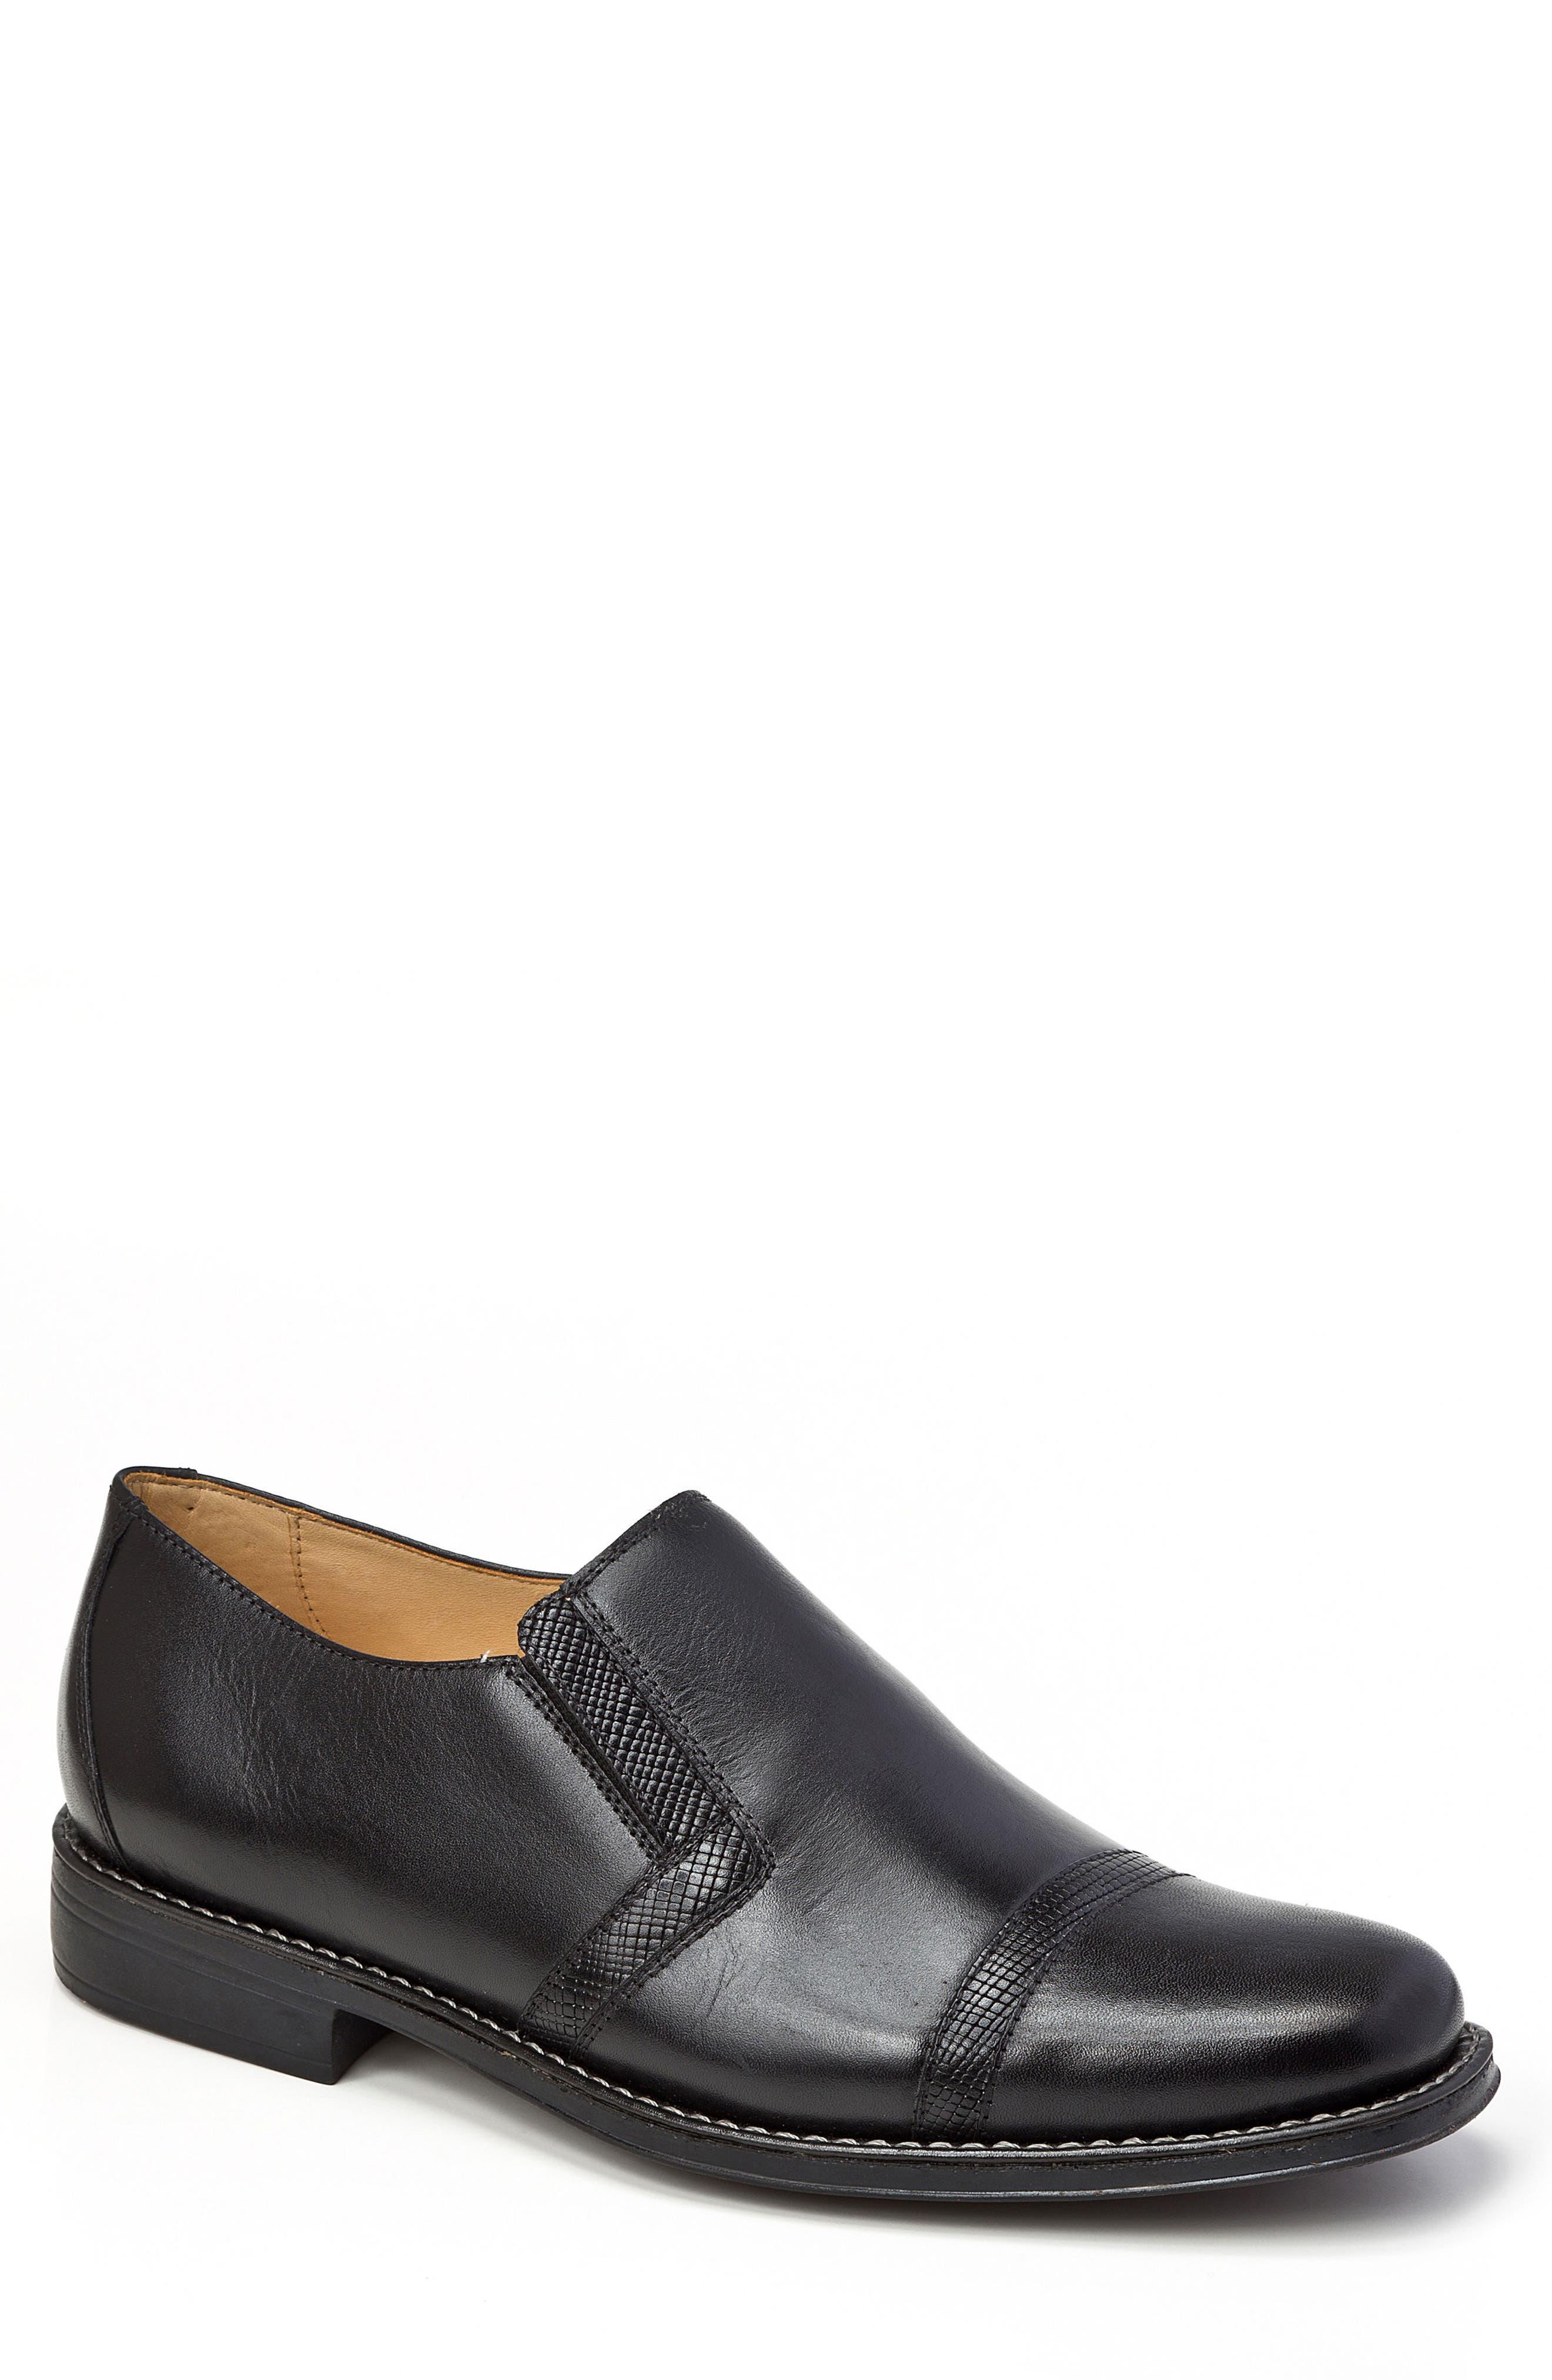 Sebastian Venetian Loafer,                         Main,                         color, BLACK LEATHER